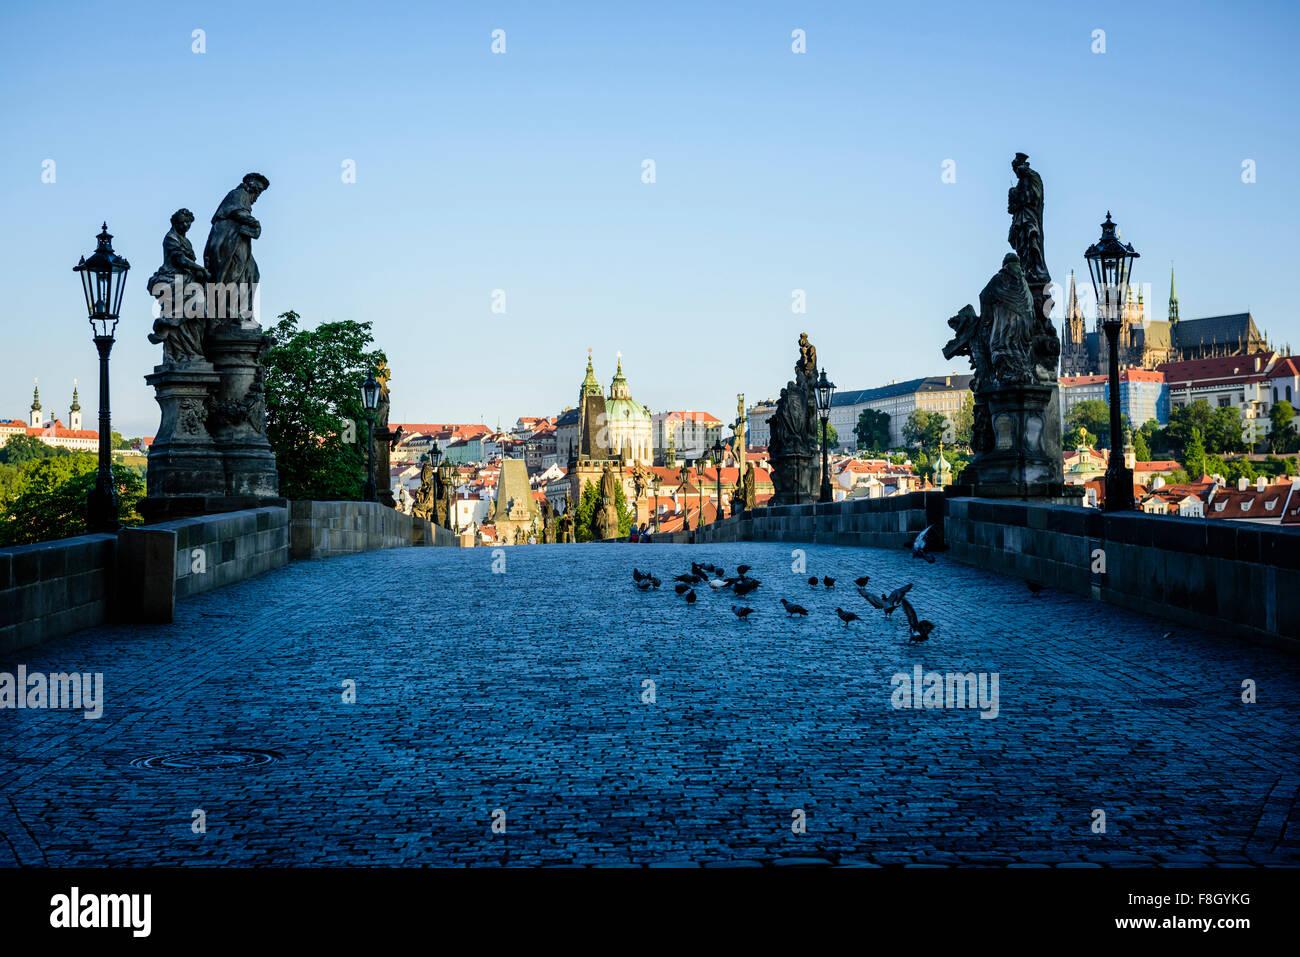 Pigeons on brick path in Prague cityscape, Czech Republic - Stock Image